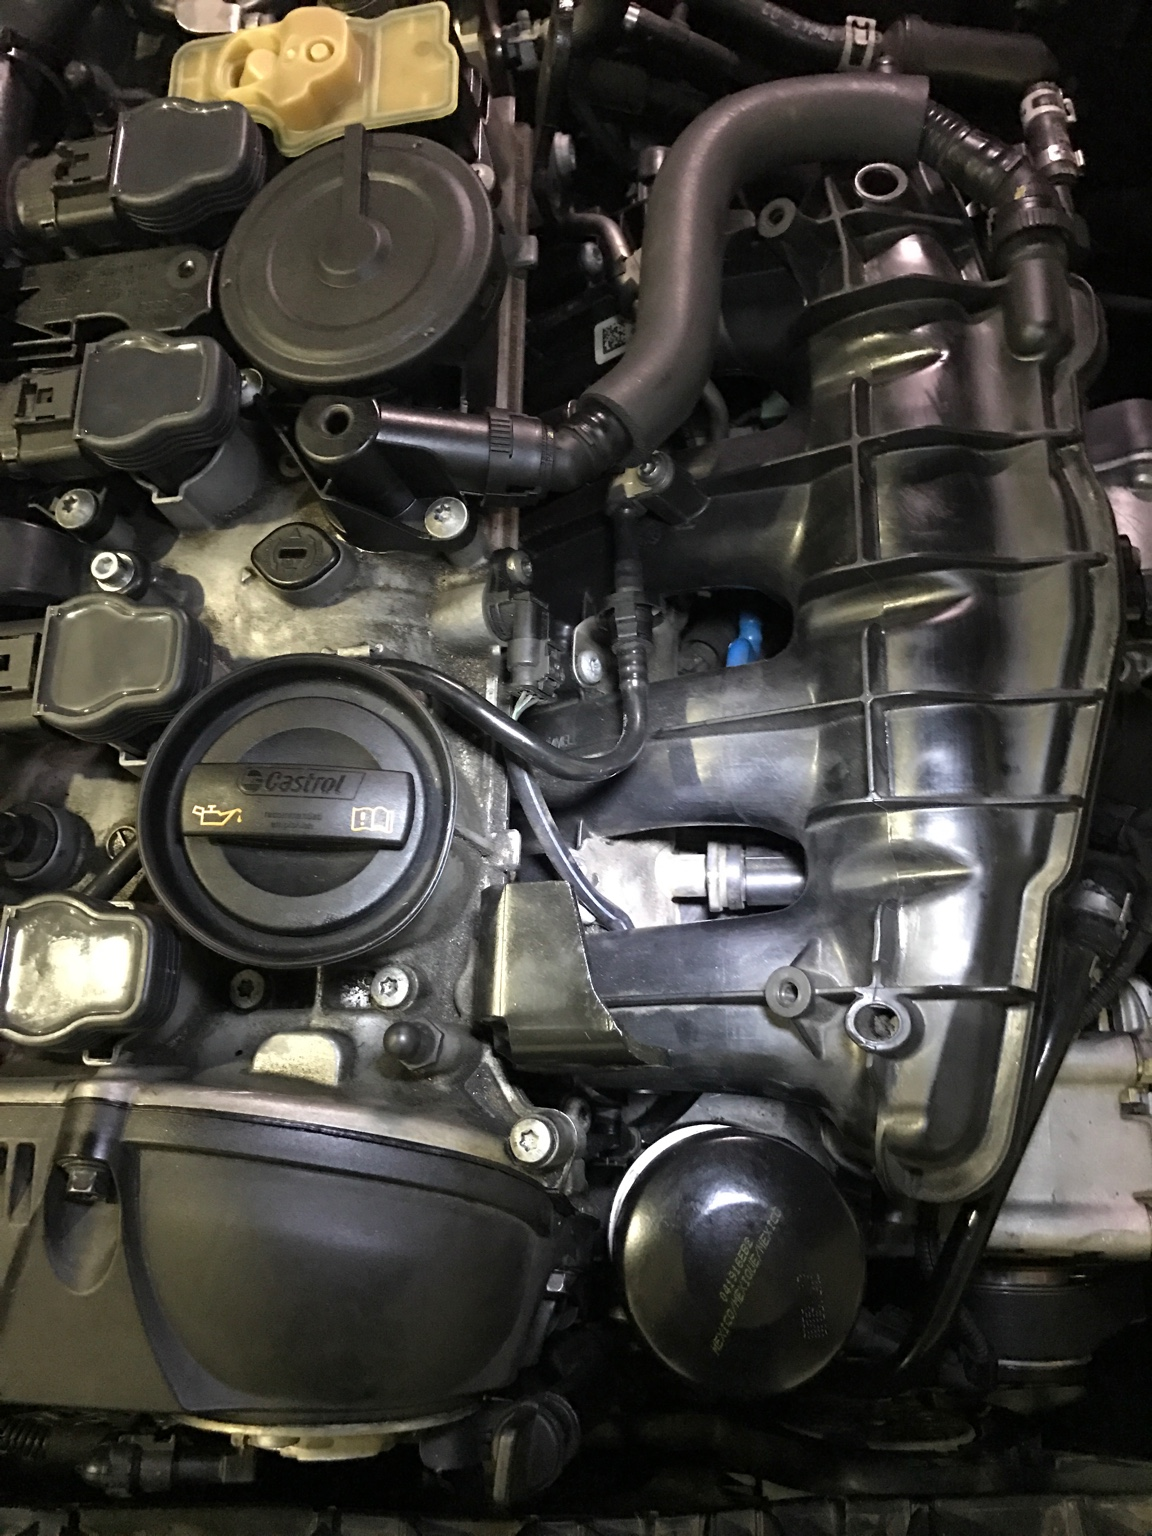 fuel pressure sensor g247 circuit malfunction